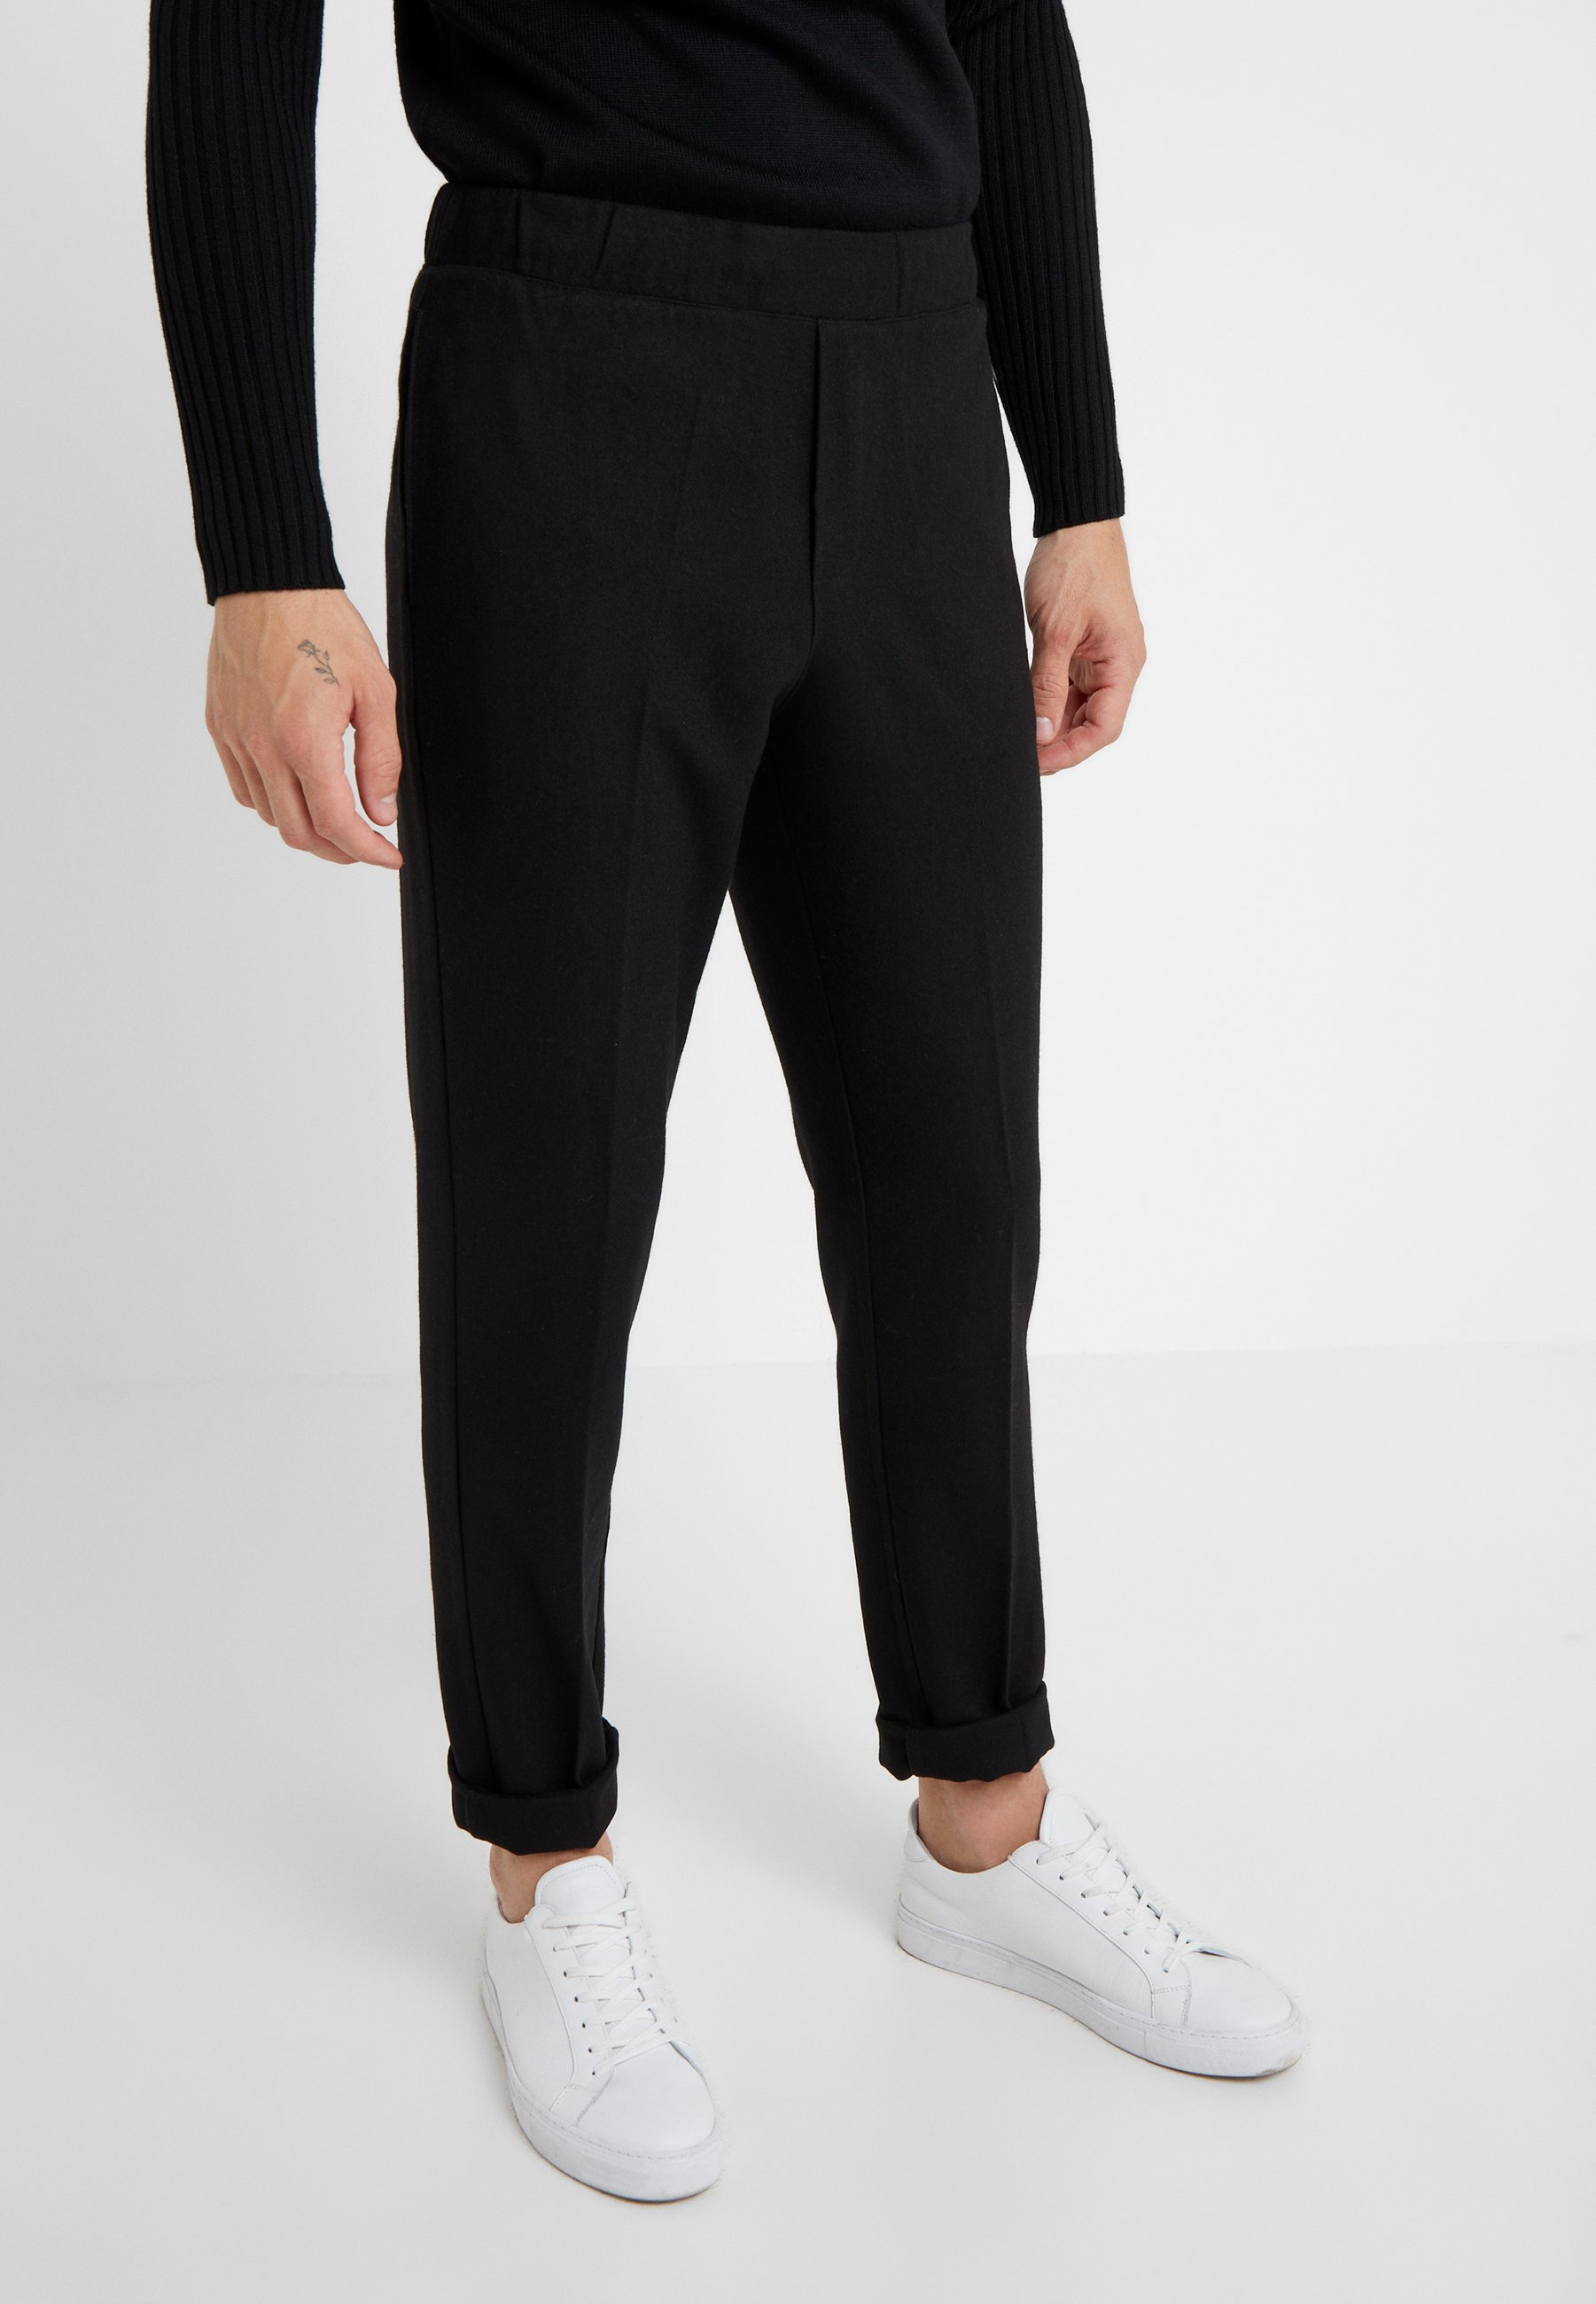 Uomo CLEMENT CLARK PANT - Pantaloni